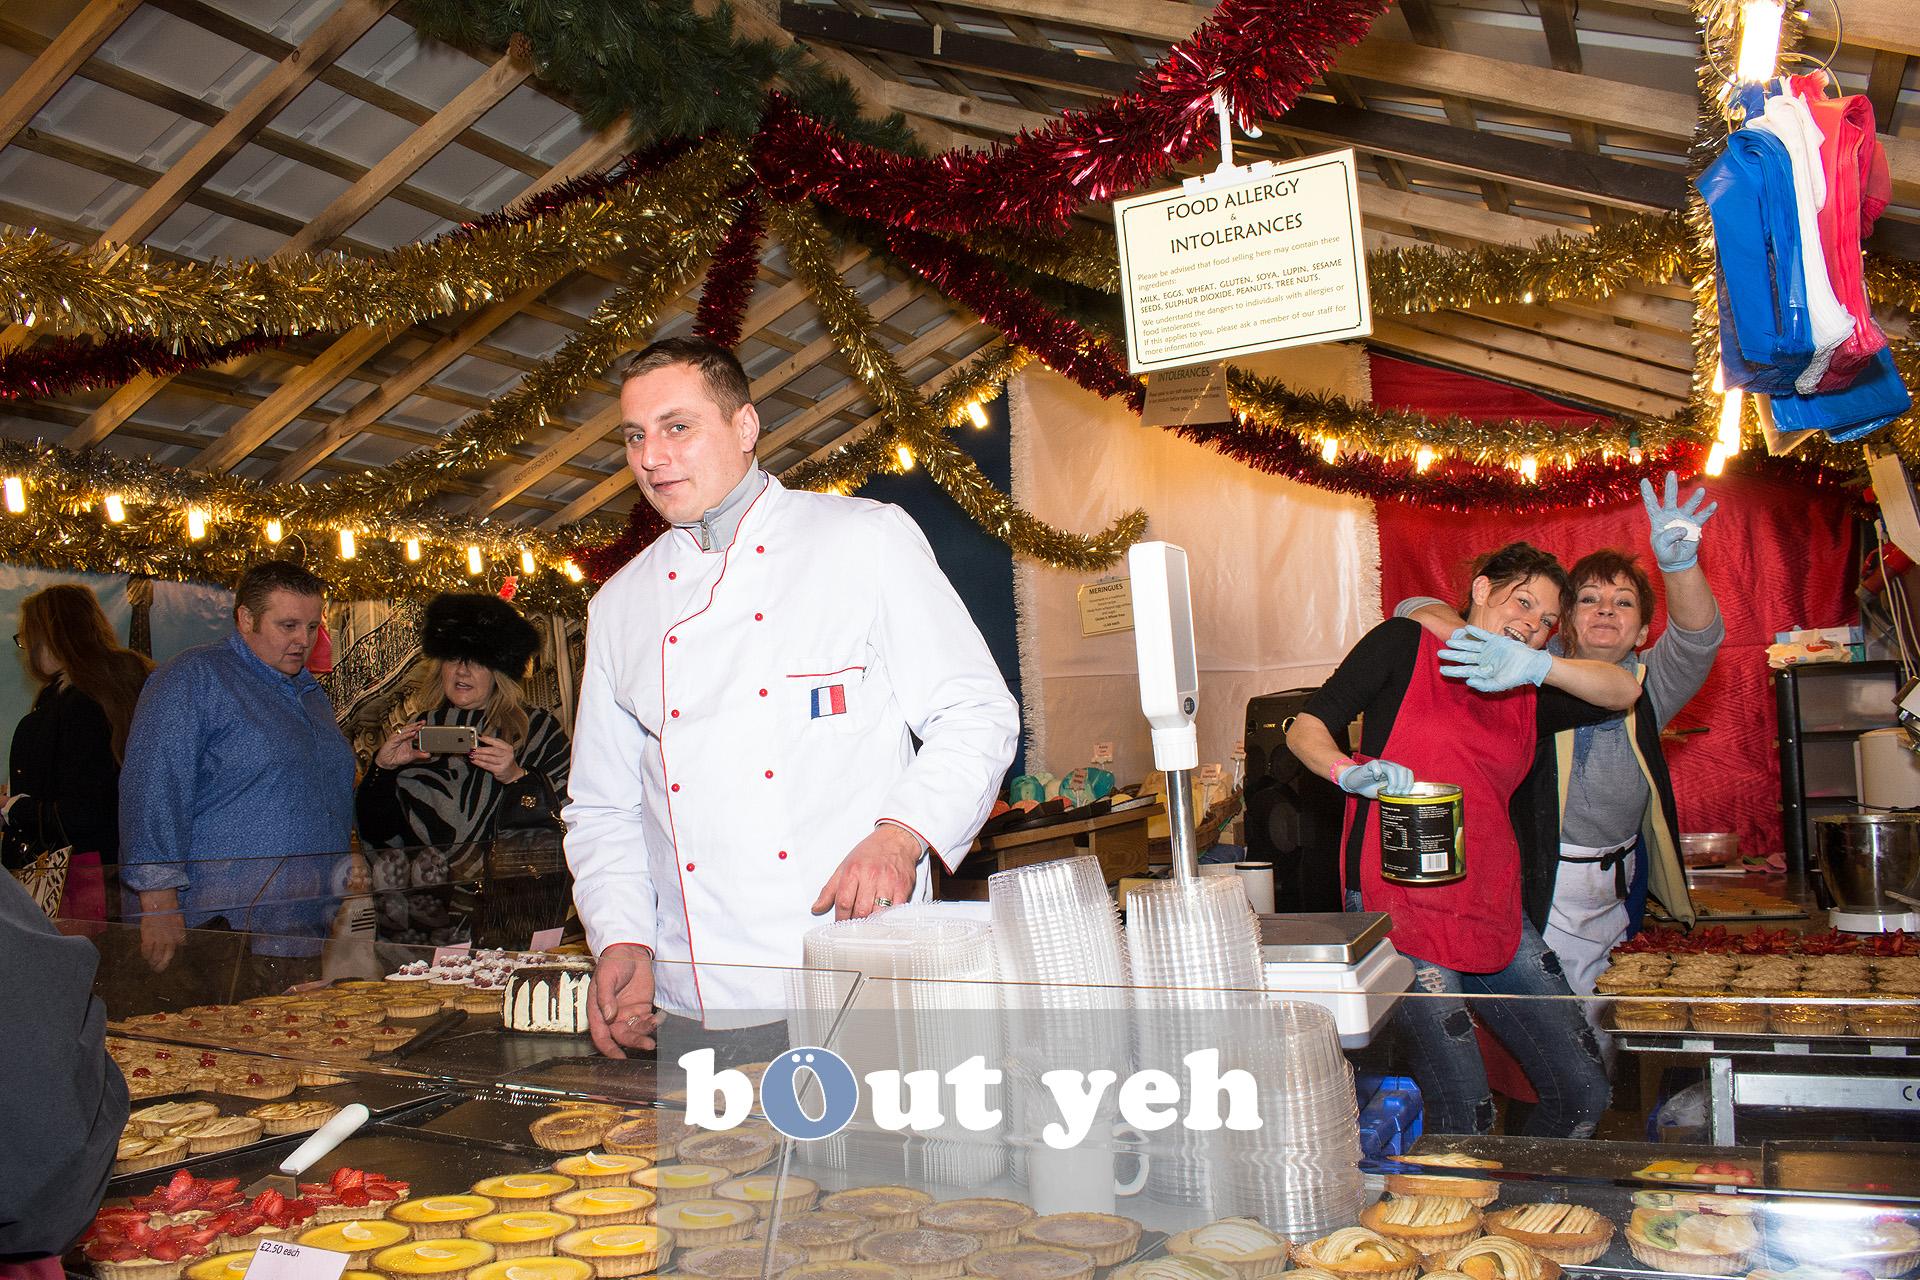 Workers at Belfast Christmas Market enjoying their work. Photo 3286.